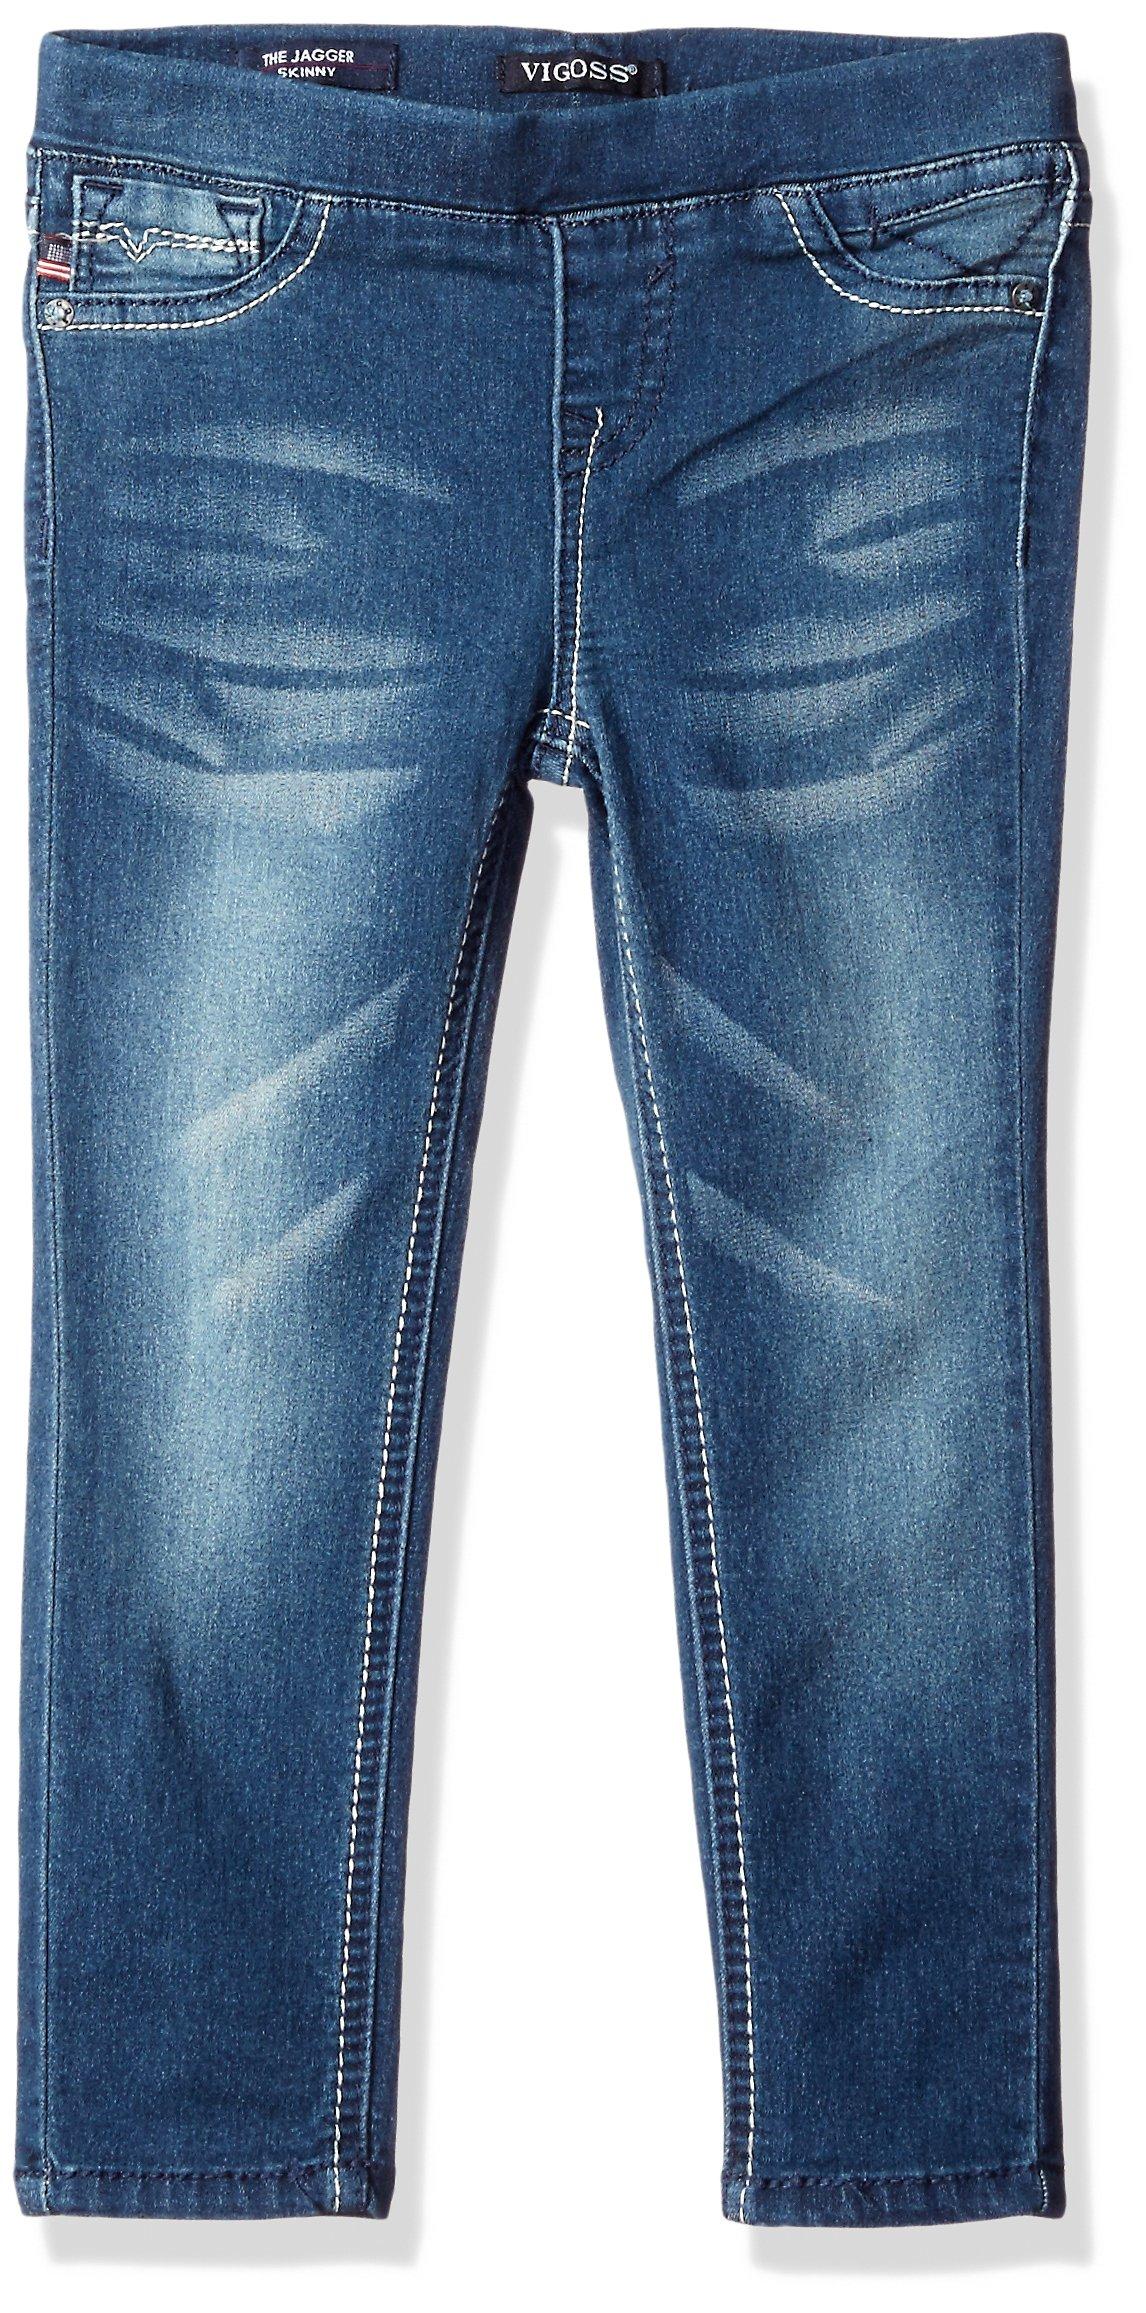 VIGOSS Girls' Girls' 5 Pocket Classic Pull on Skinny Jean, True Blue, 2T